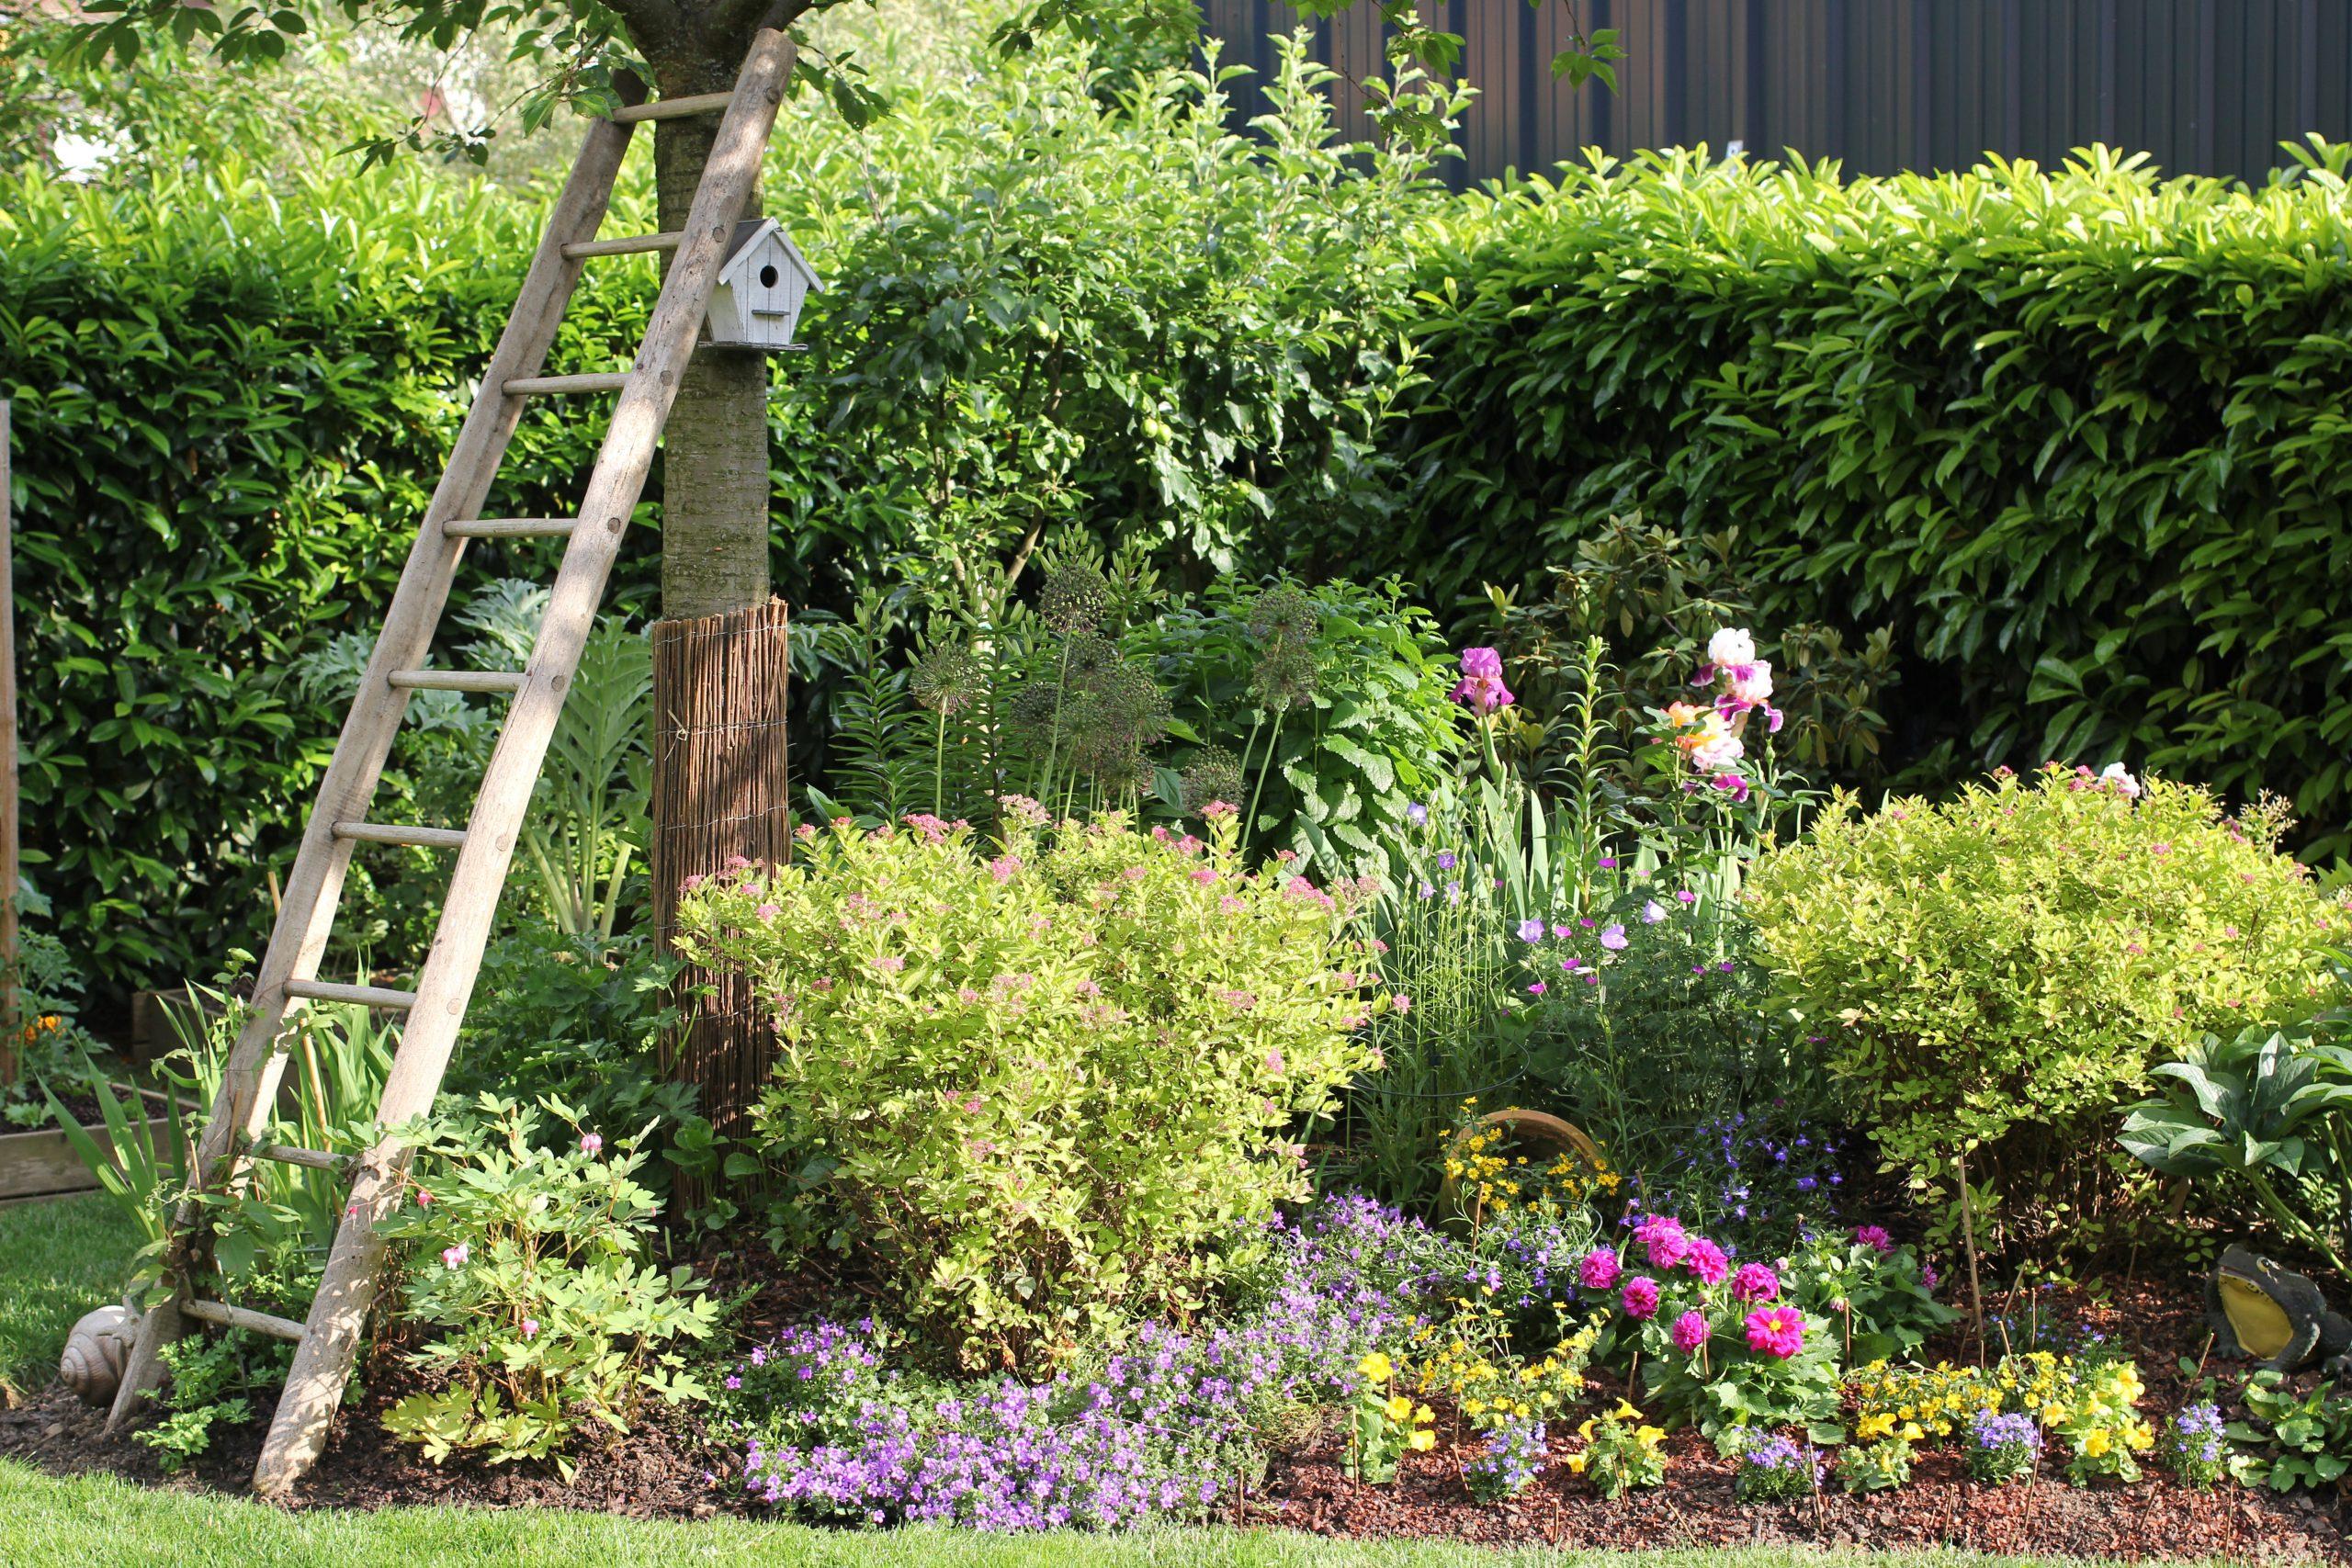 Aménager Son Jardin : Budget Et Conseils concernant Aménagement Du Jardin Photo